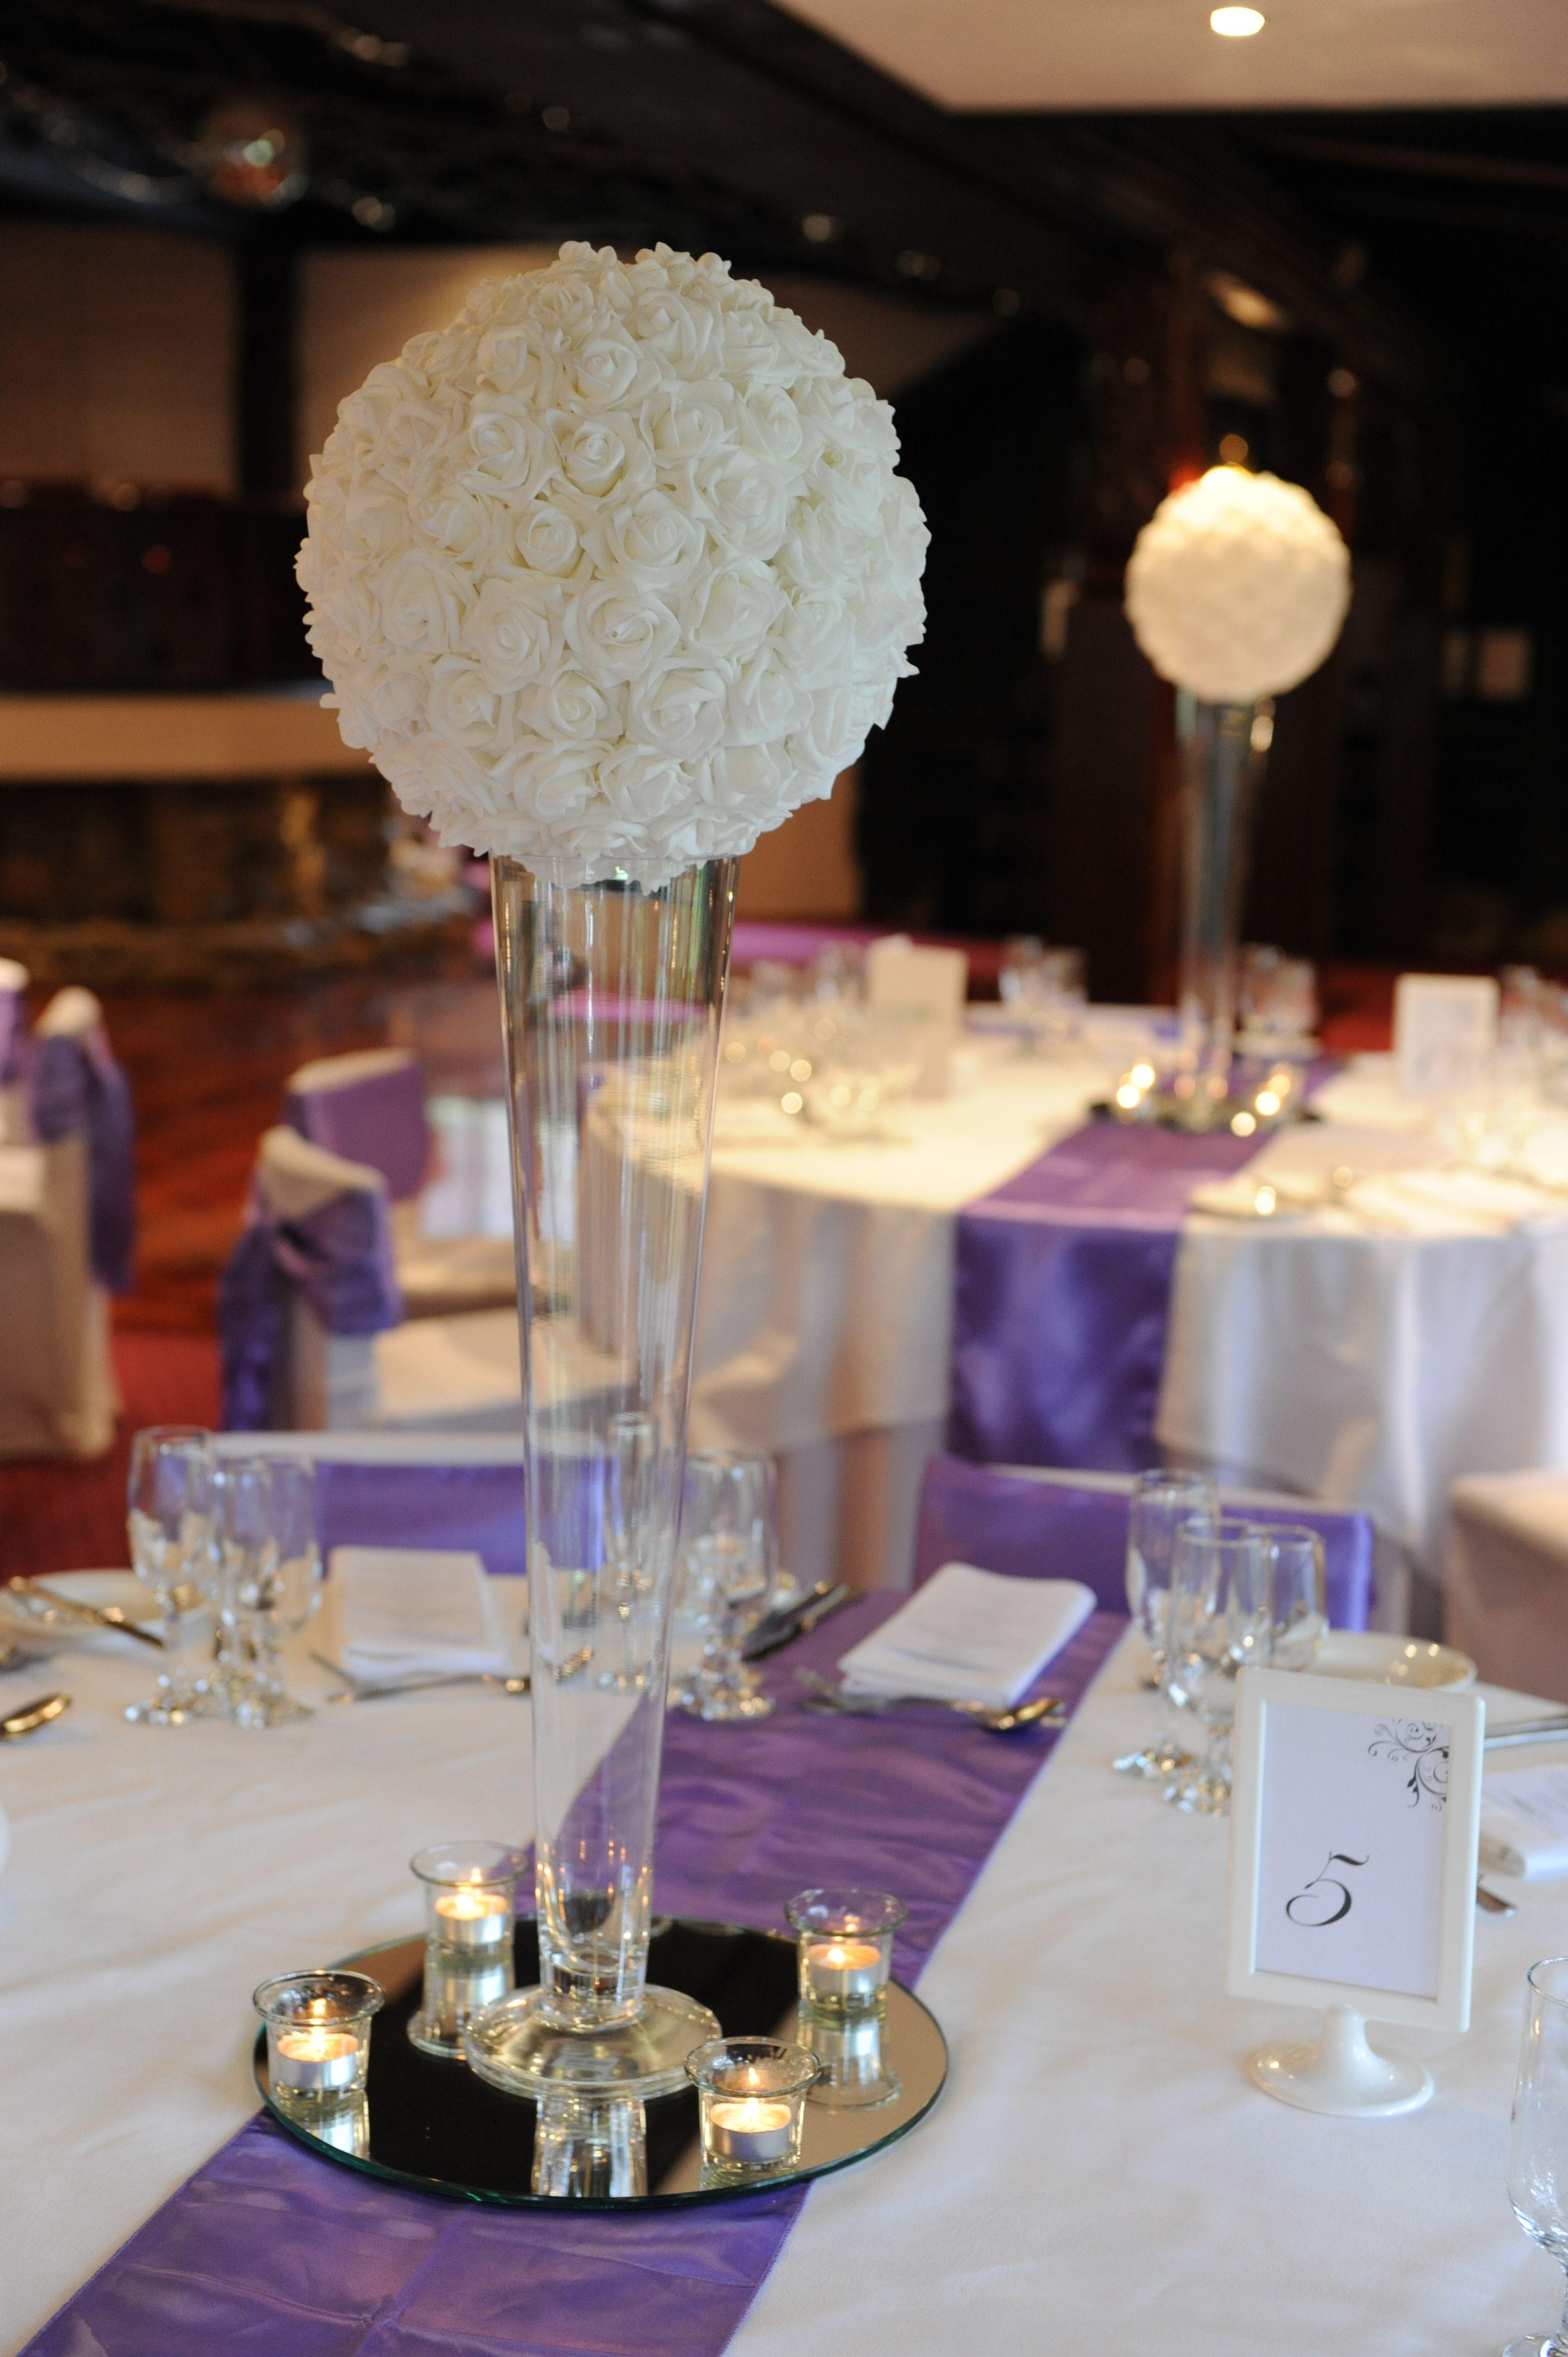 White Rose Ball On Trumpet Vase From Chateau Wyuna Centrepiece Range Flower Ball Centerpiece Glass Vase Wedding Centerpieces Trumpet Vase Centerpiece